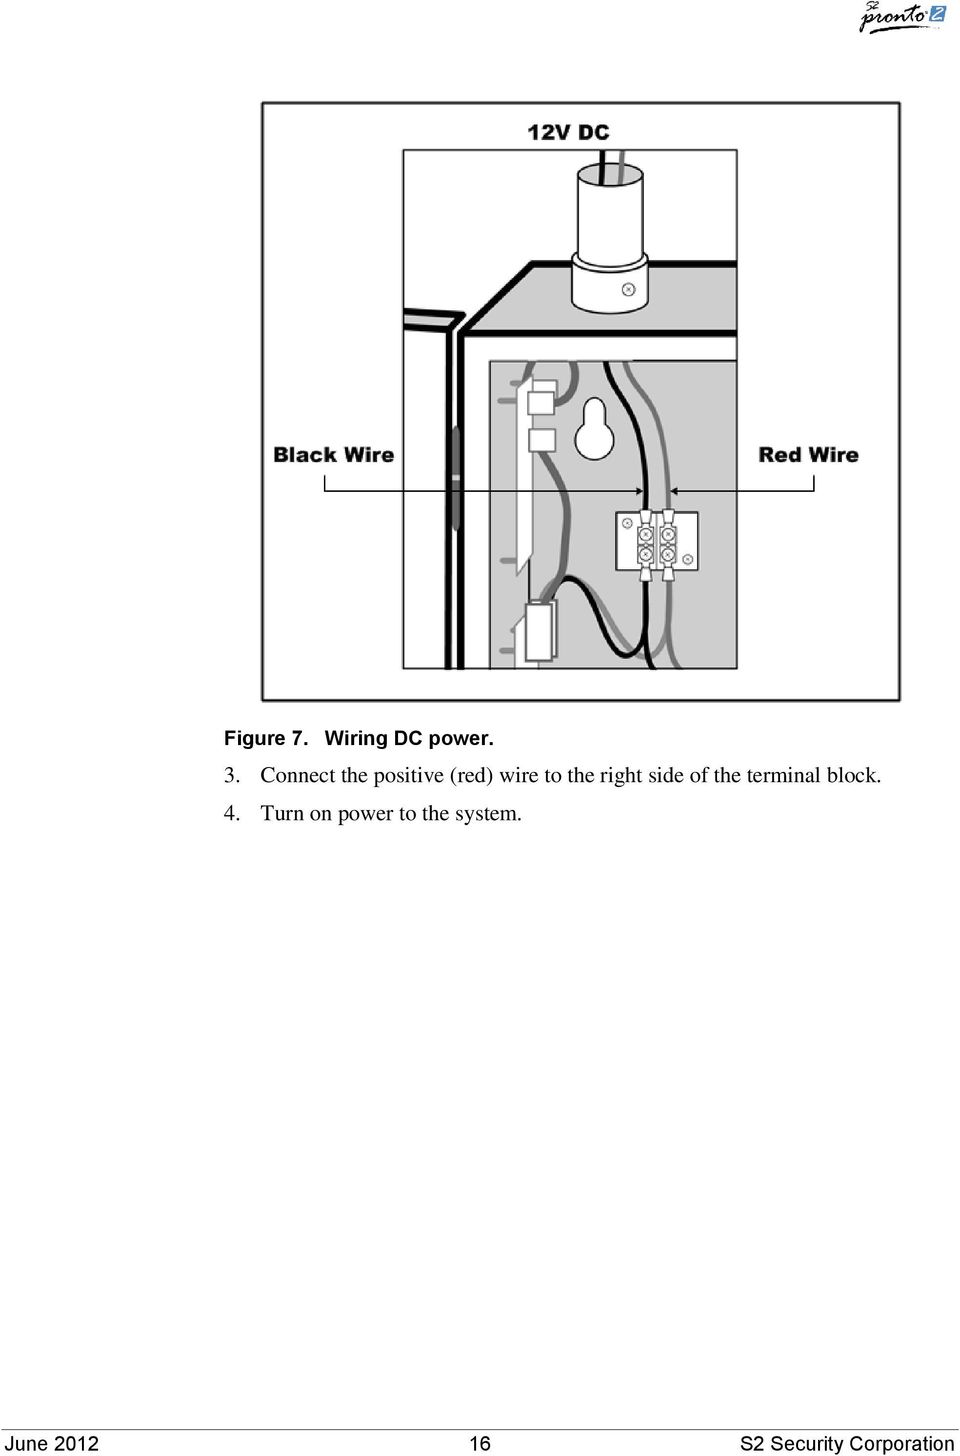 keyscan wiring diagram